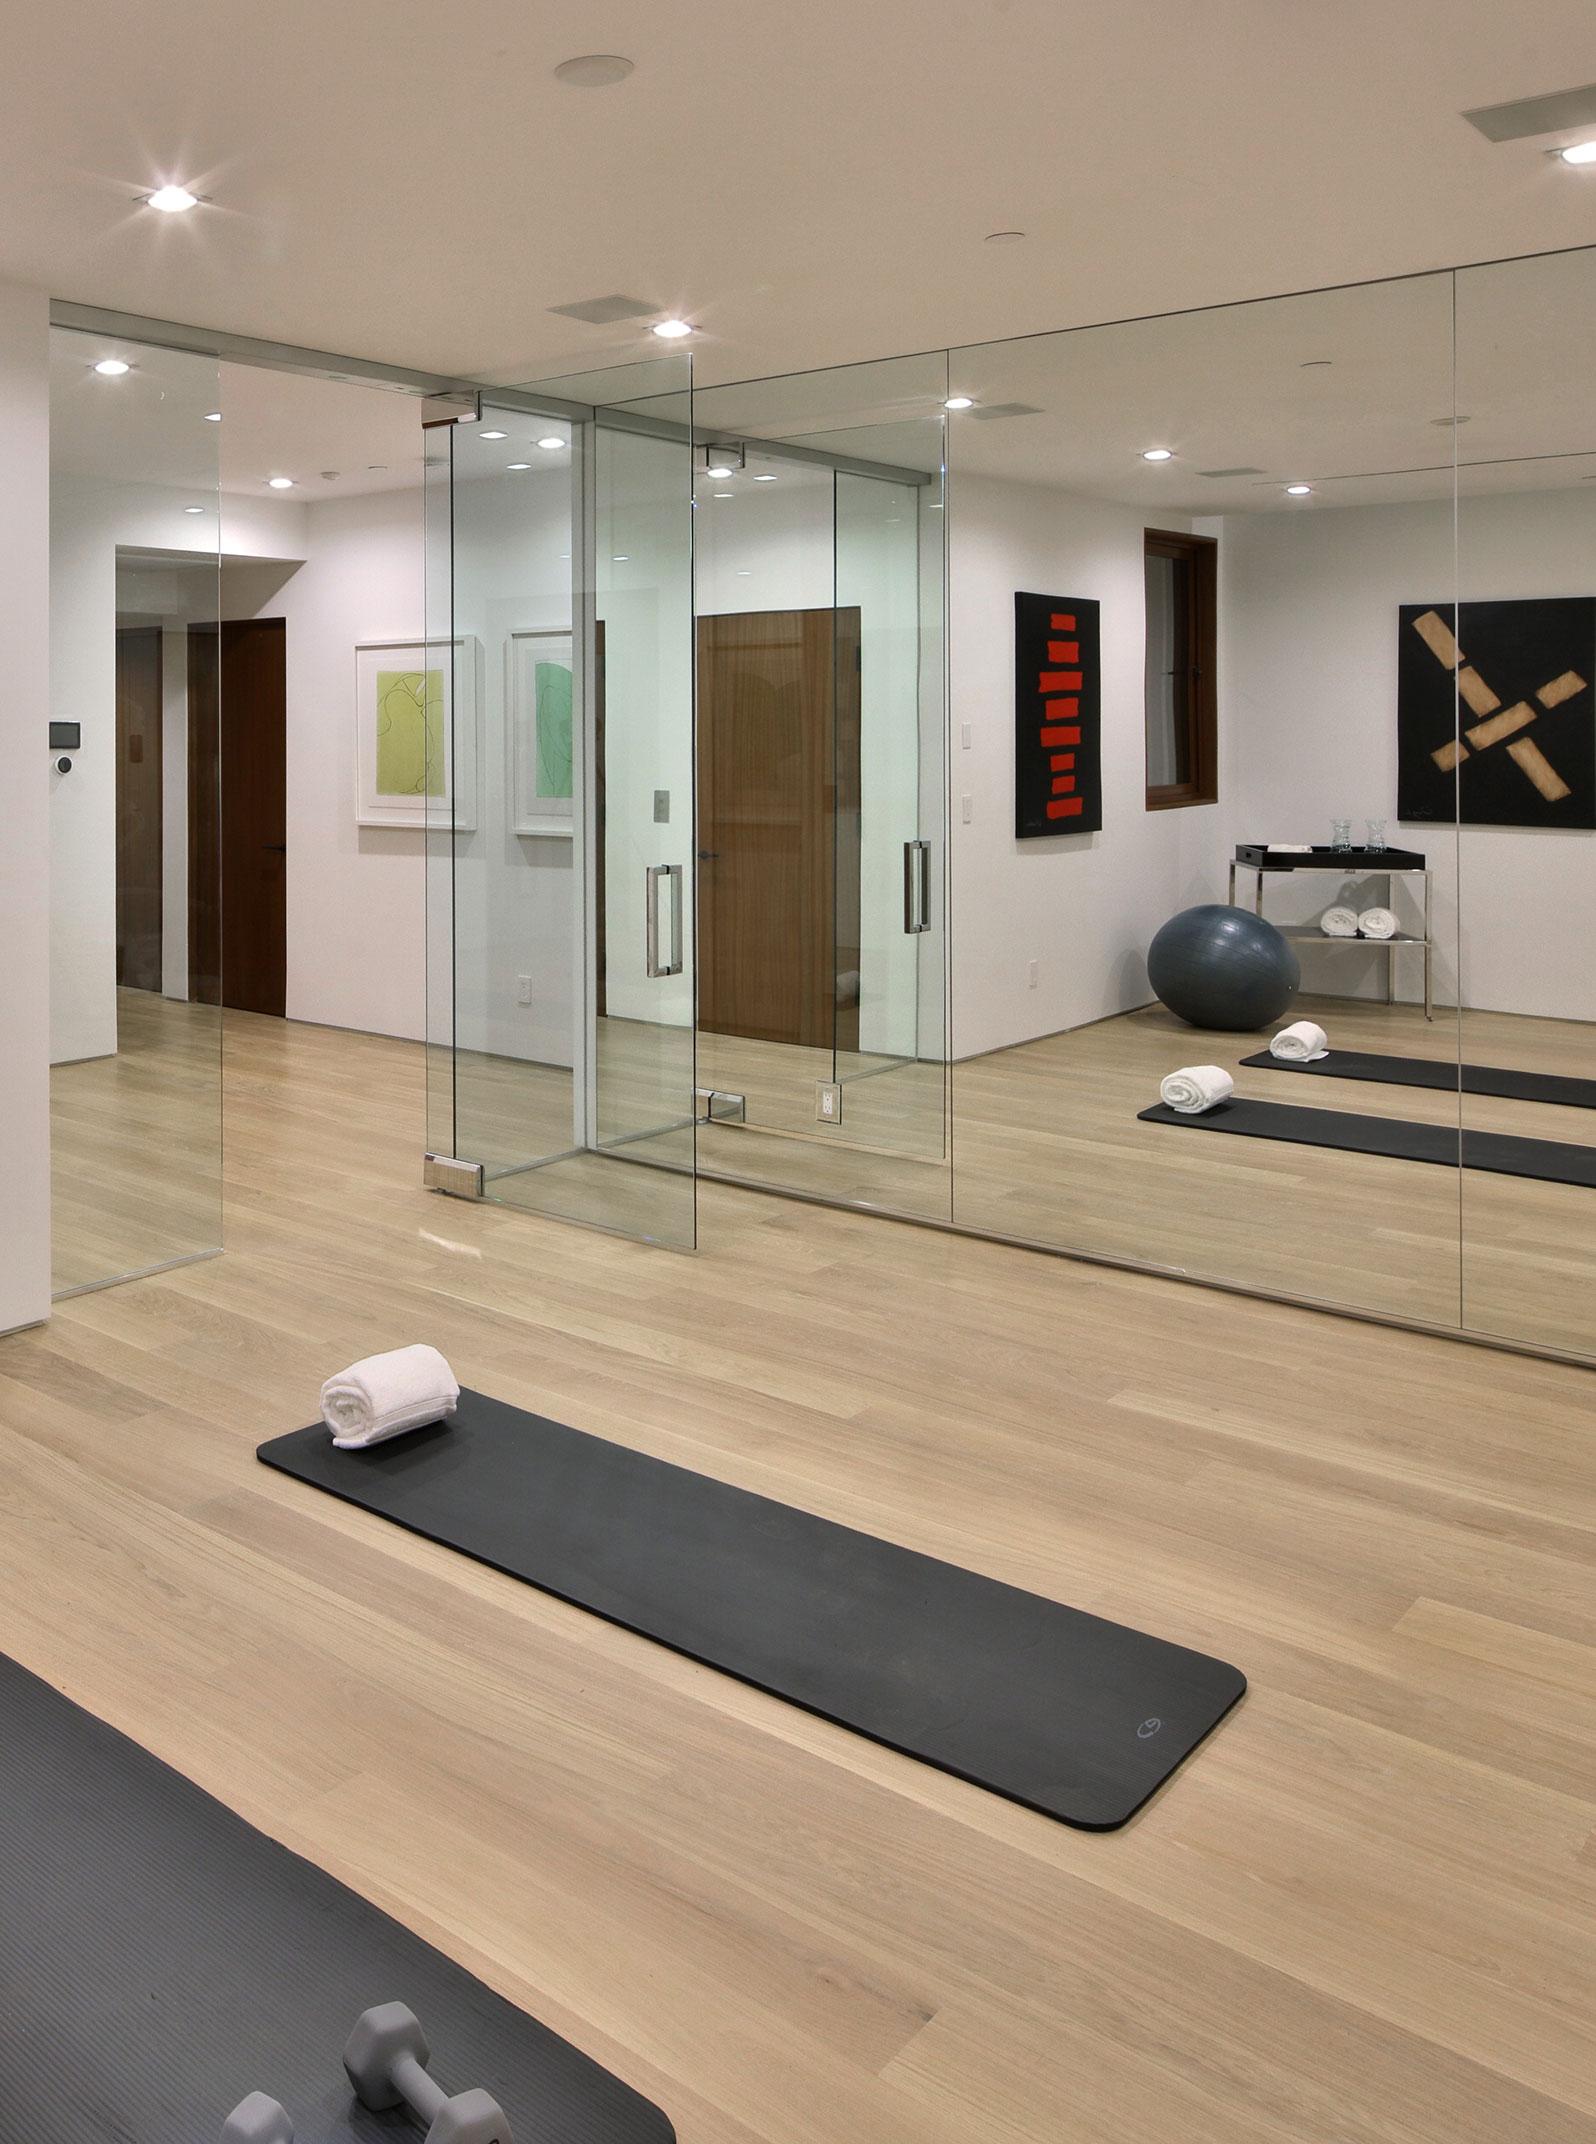 7-home-gym-modern-los-angeles-SiliconBay.jpg